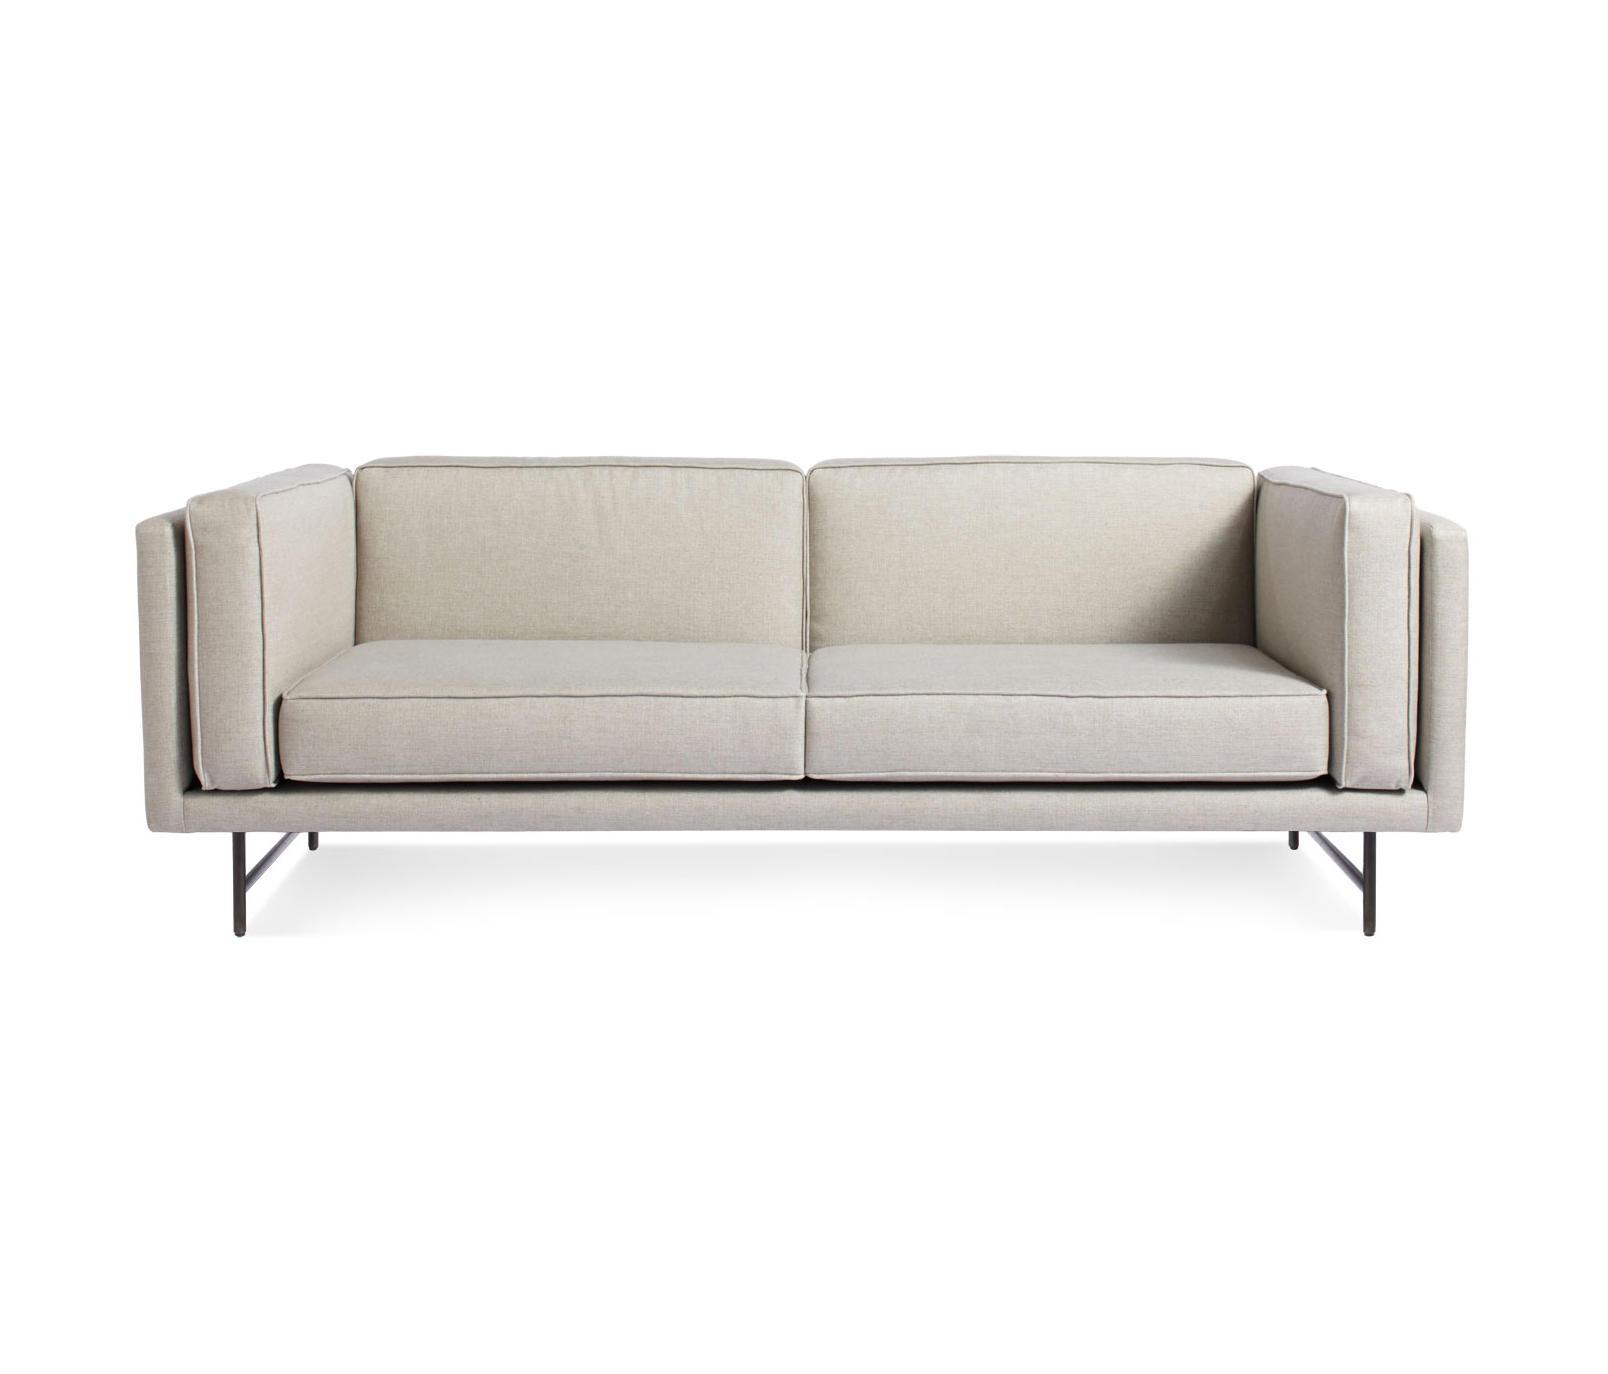 "BANK 80"" SOFA Lounge sofas from Blu Dot"